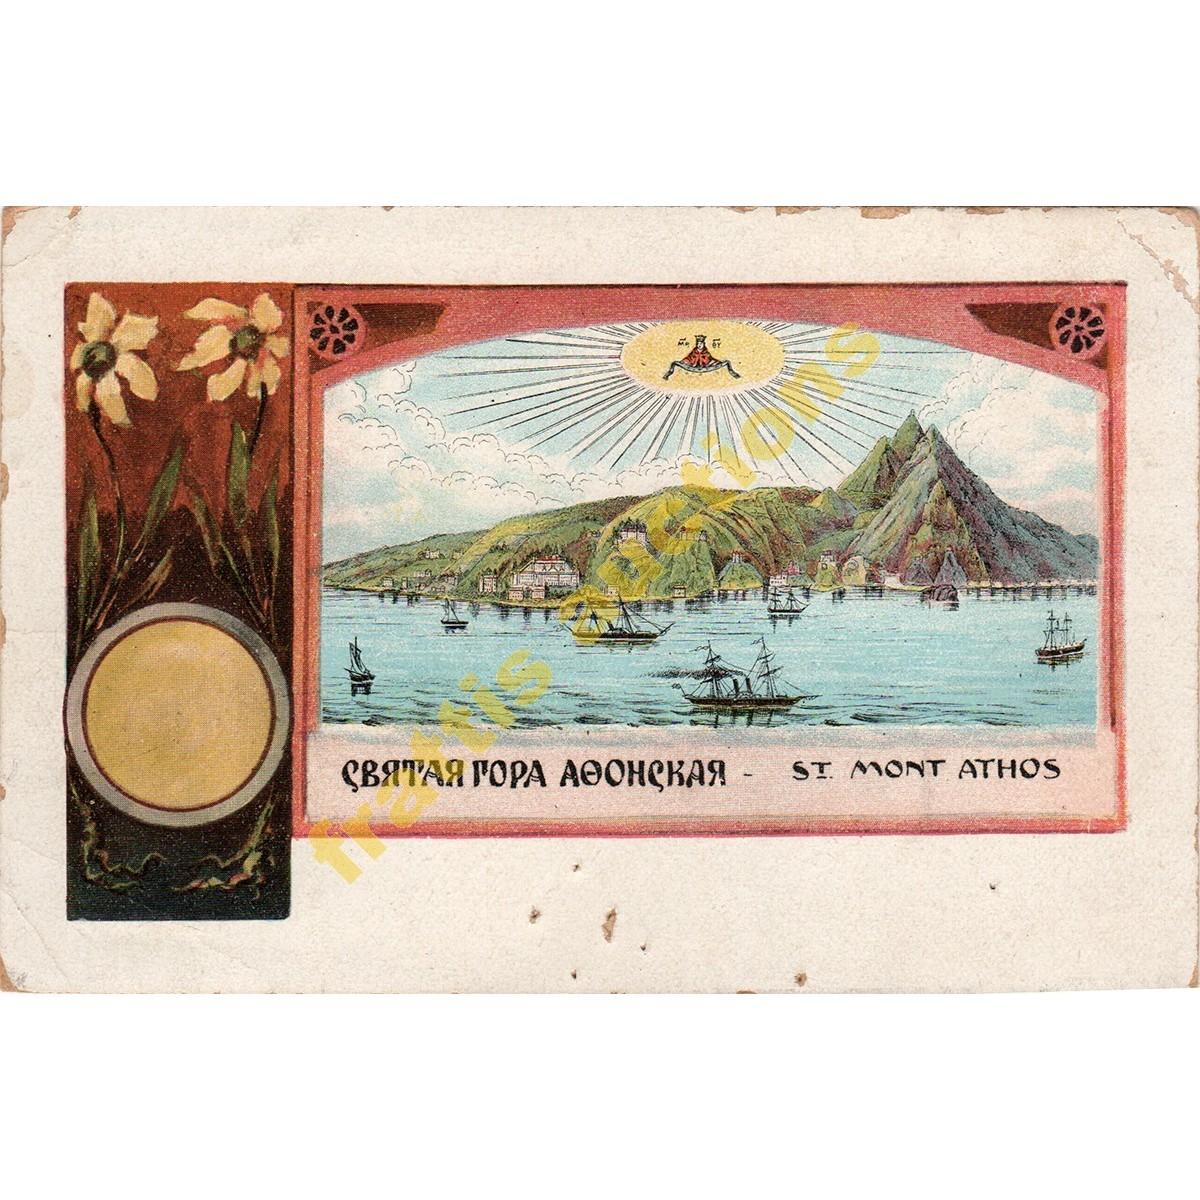 St. Mont Athos, K. G. Samardjeff, Salonique, 3691